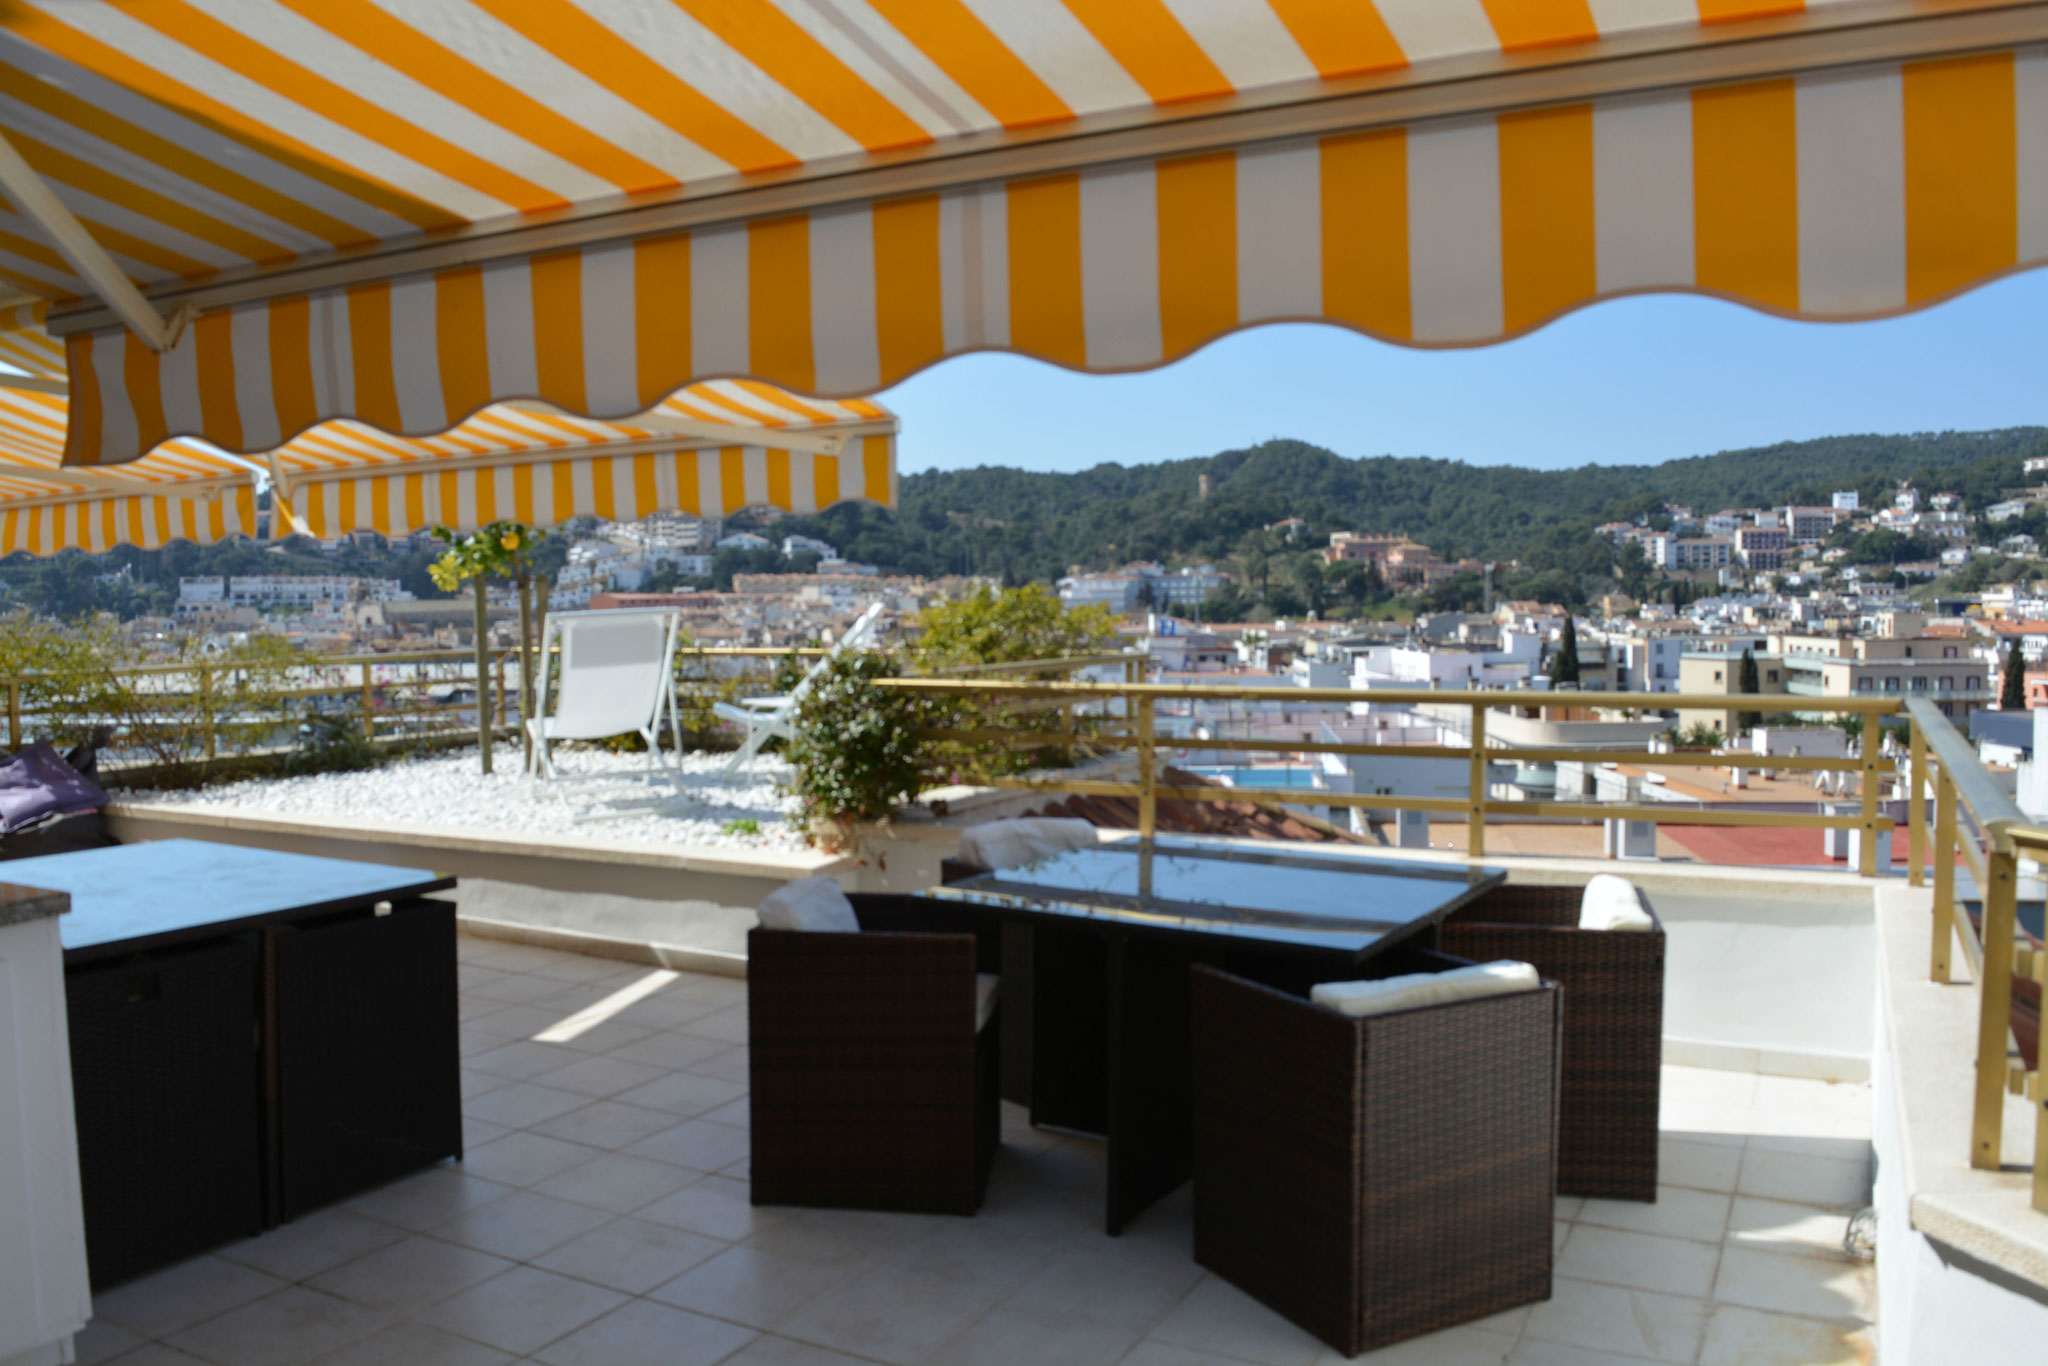 taula de còctel a la terrassa